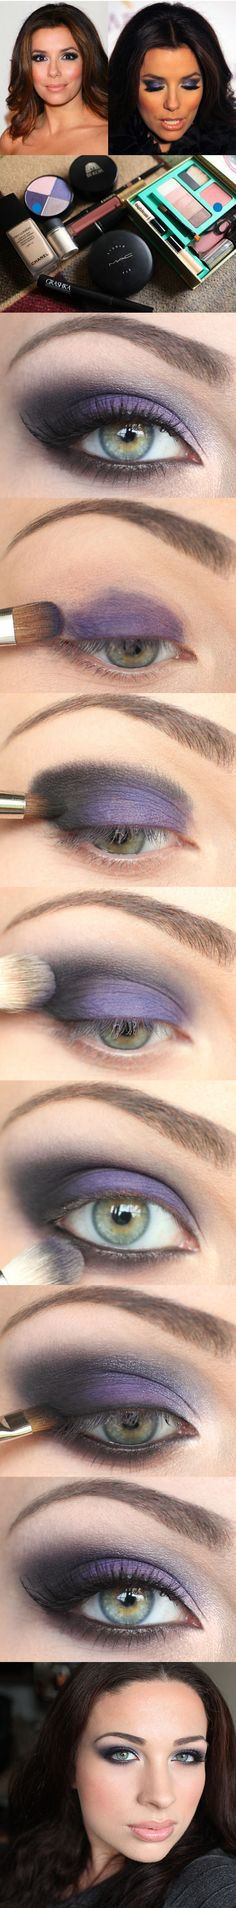 DIY Makeup   EYESHADOW :: Eva Longoria's Purple Look Tutorial   #eyeshadow #evalongoria